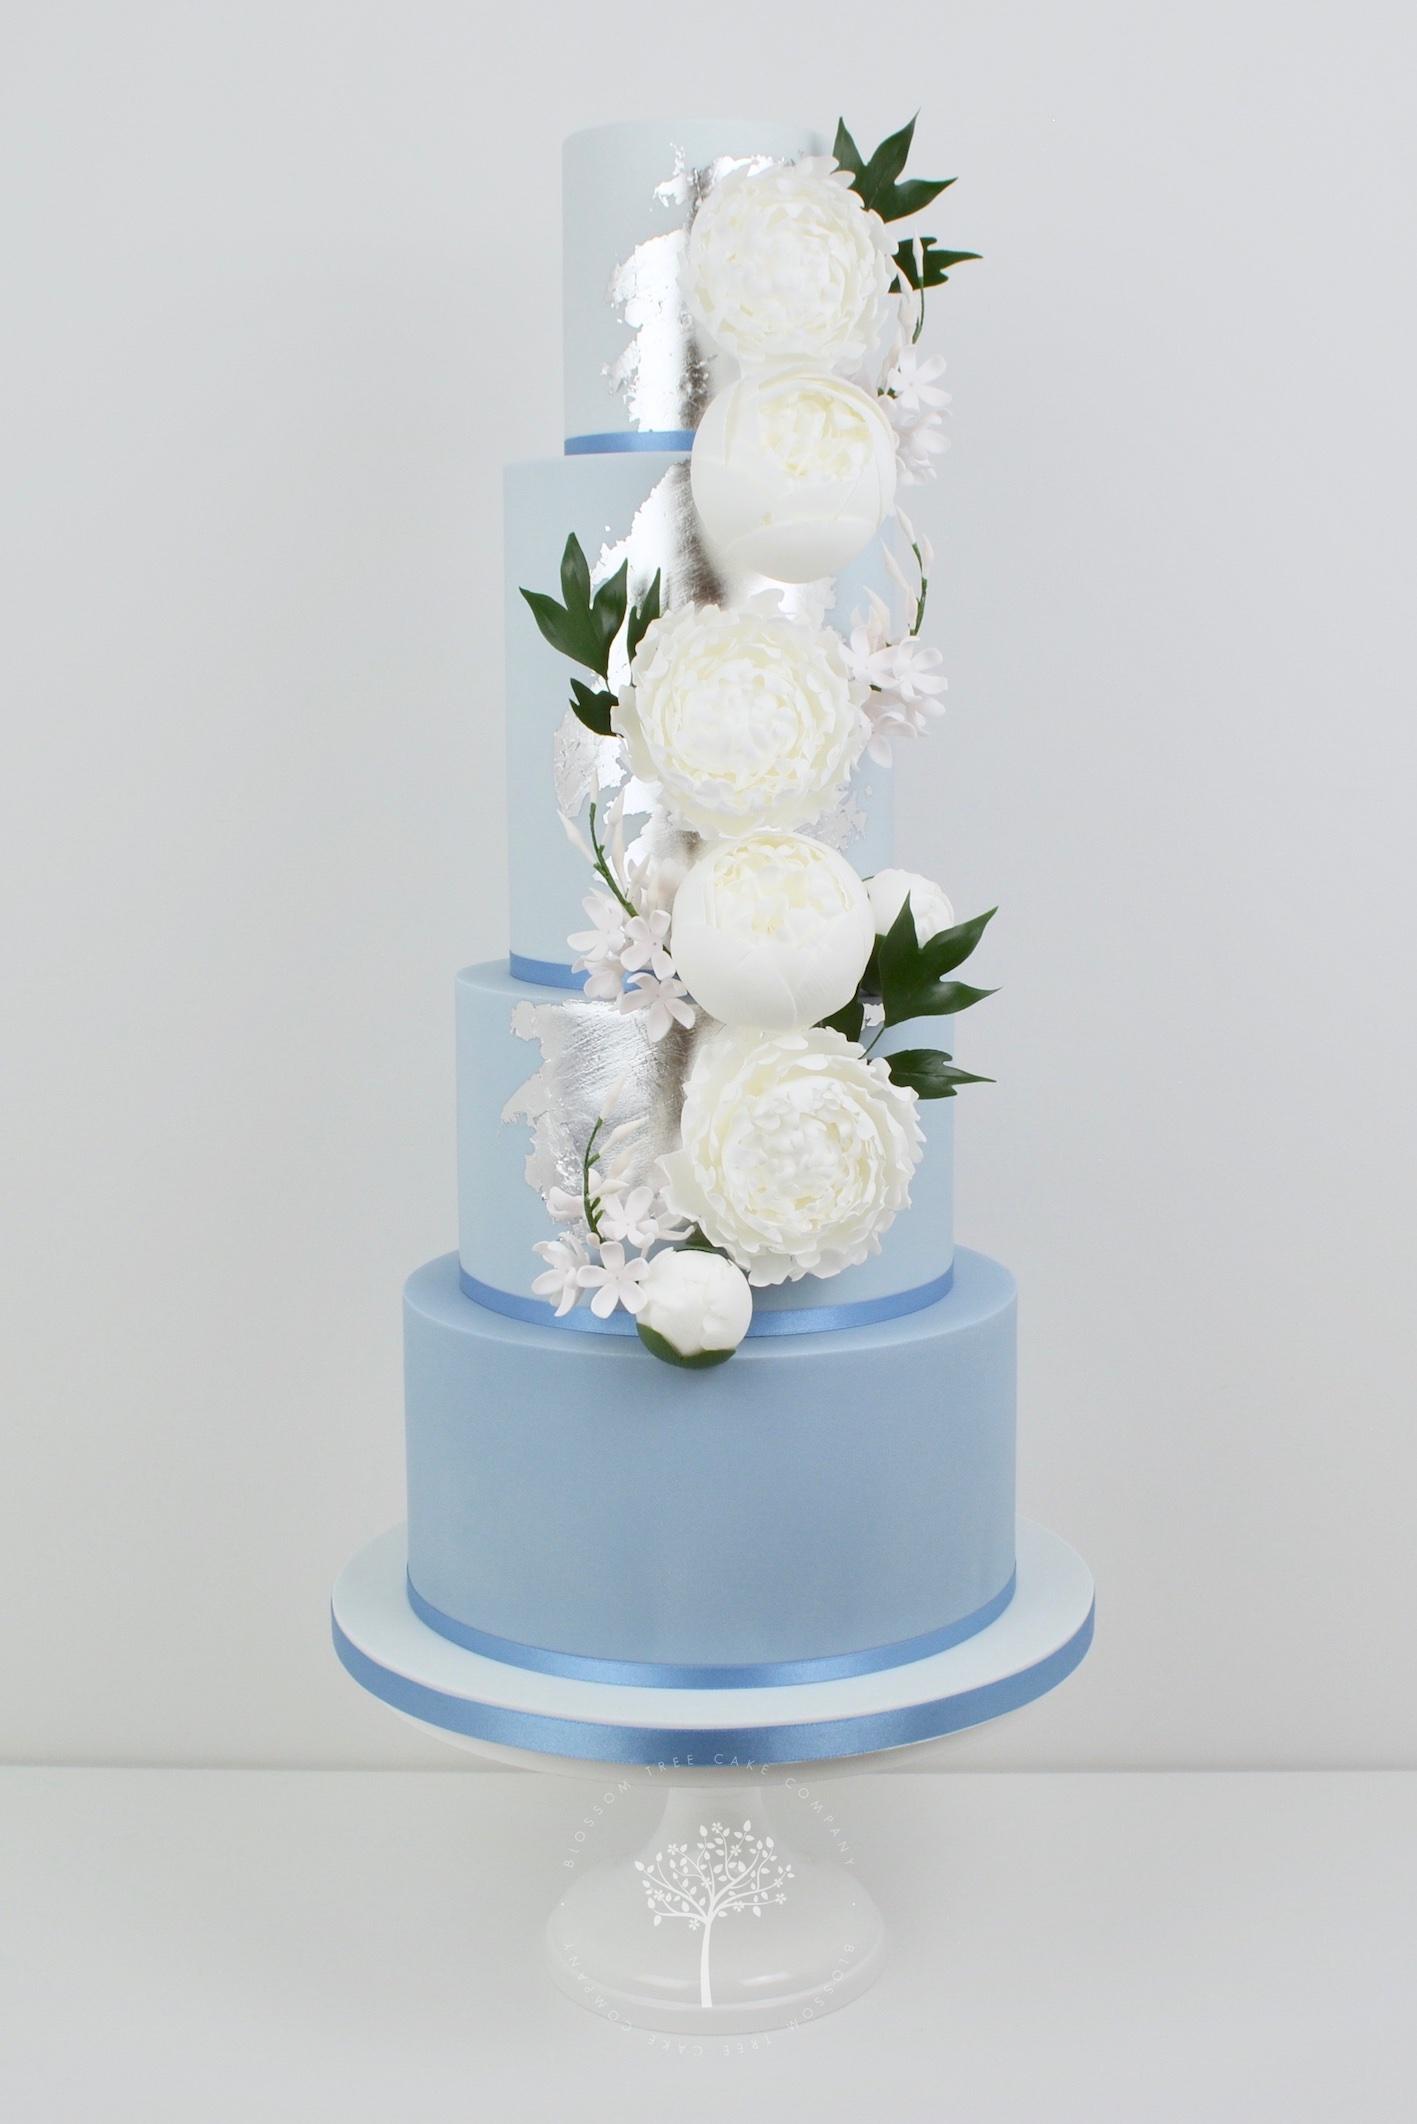 Dusky Blue and Peony wedding cake by Blossom Tree Cake Company Harrogate North Yorkshire.jpg